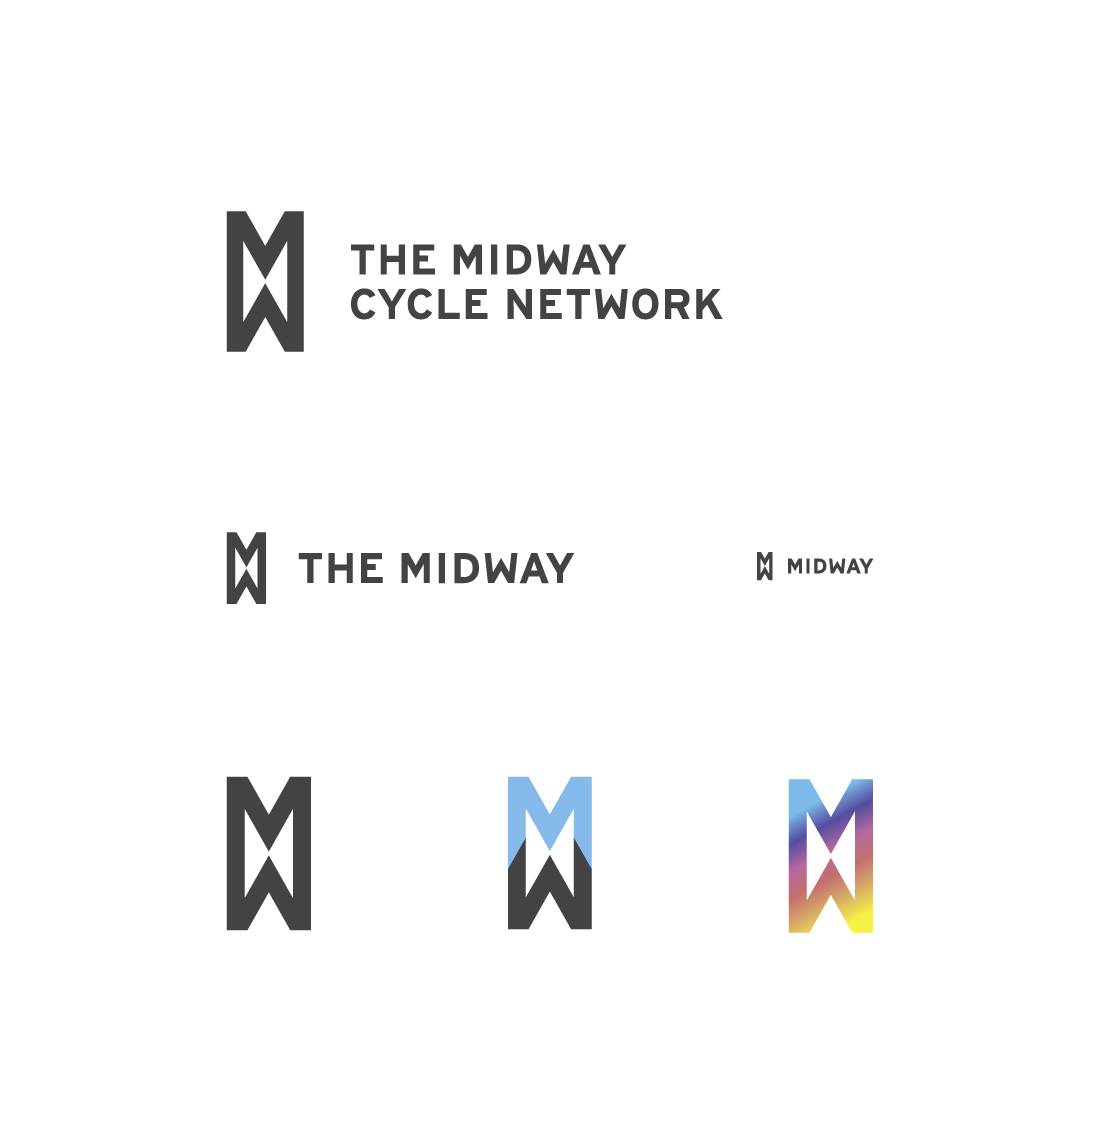 TheMidway-Identity-InProgress-ID